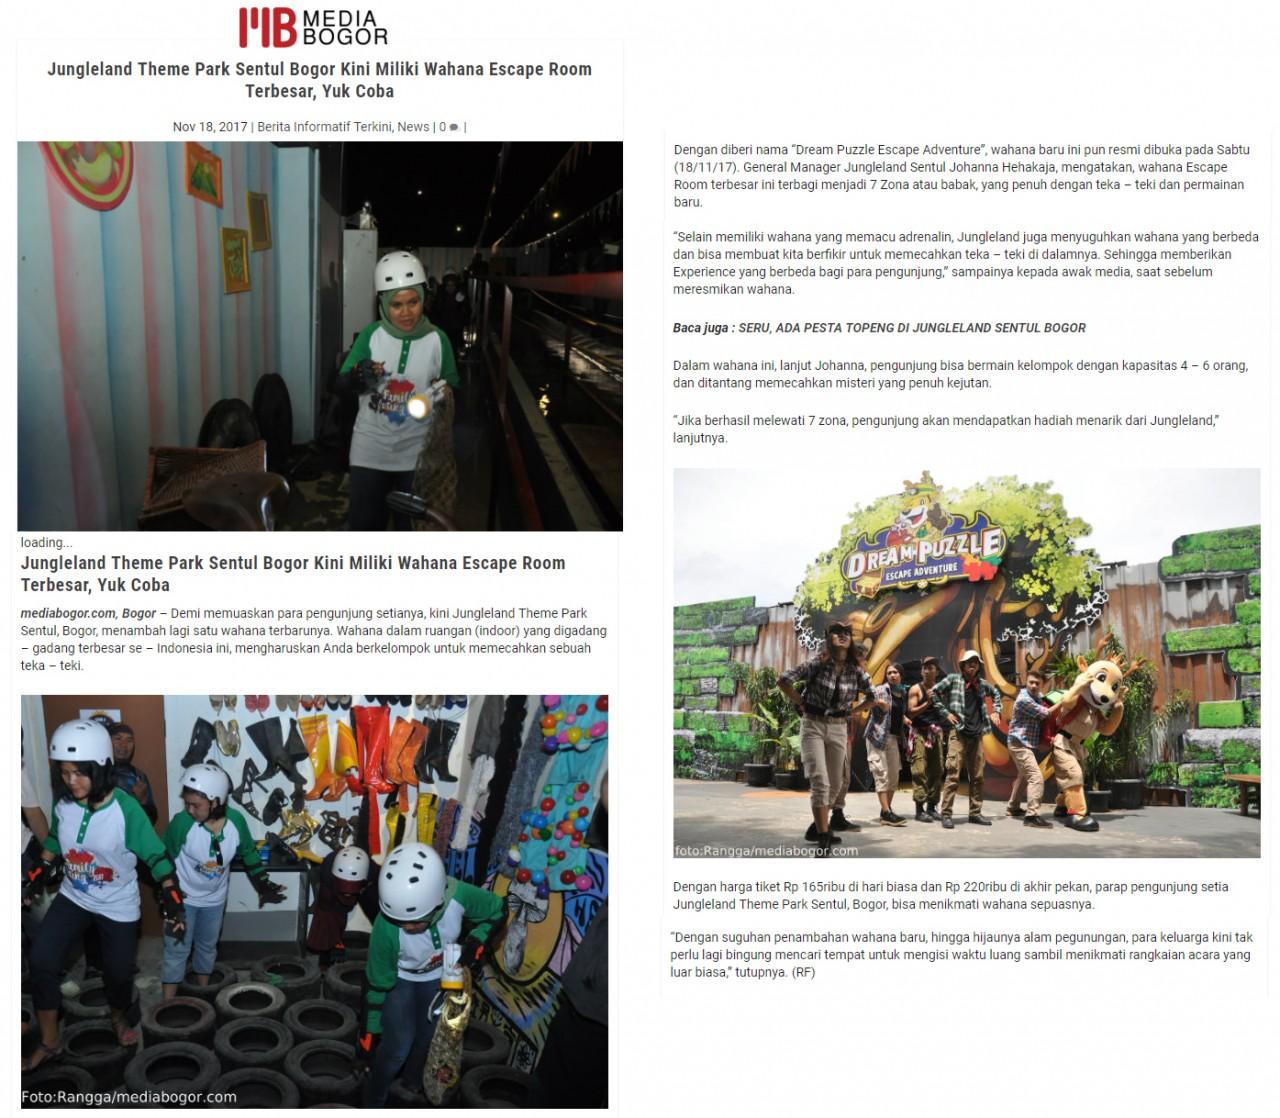 Media Clipping Pt Bakrieland Development Tbk Annual Pass Jungle Land Sentul Jungleland Theme Park Bogor Kini Miliki Wahana Escape Room Terbesar Yuk Coba